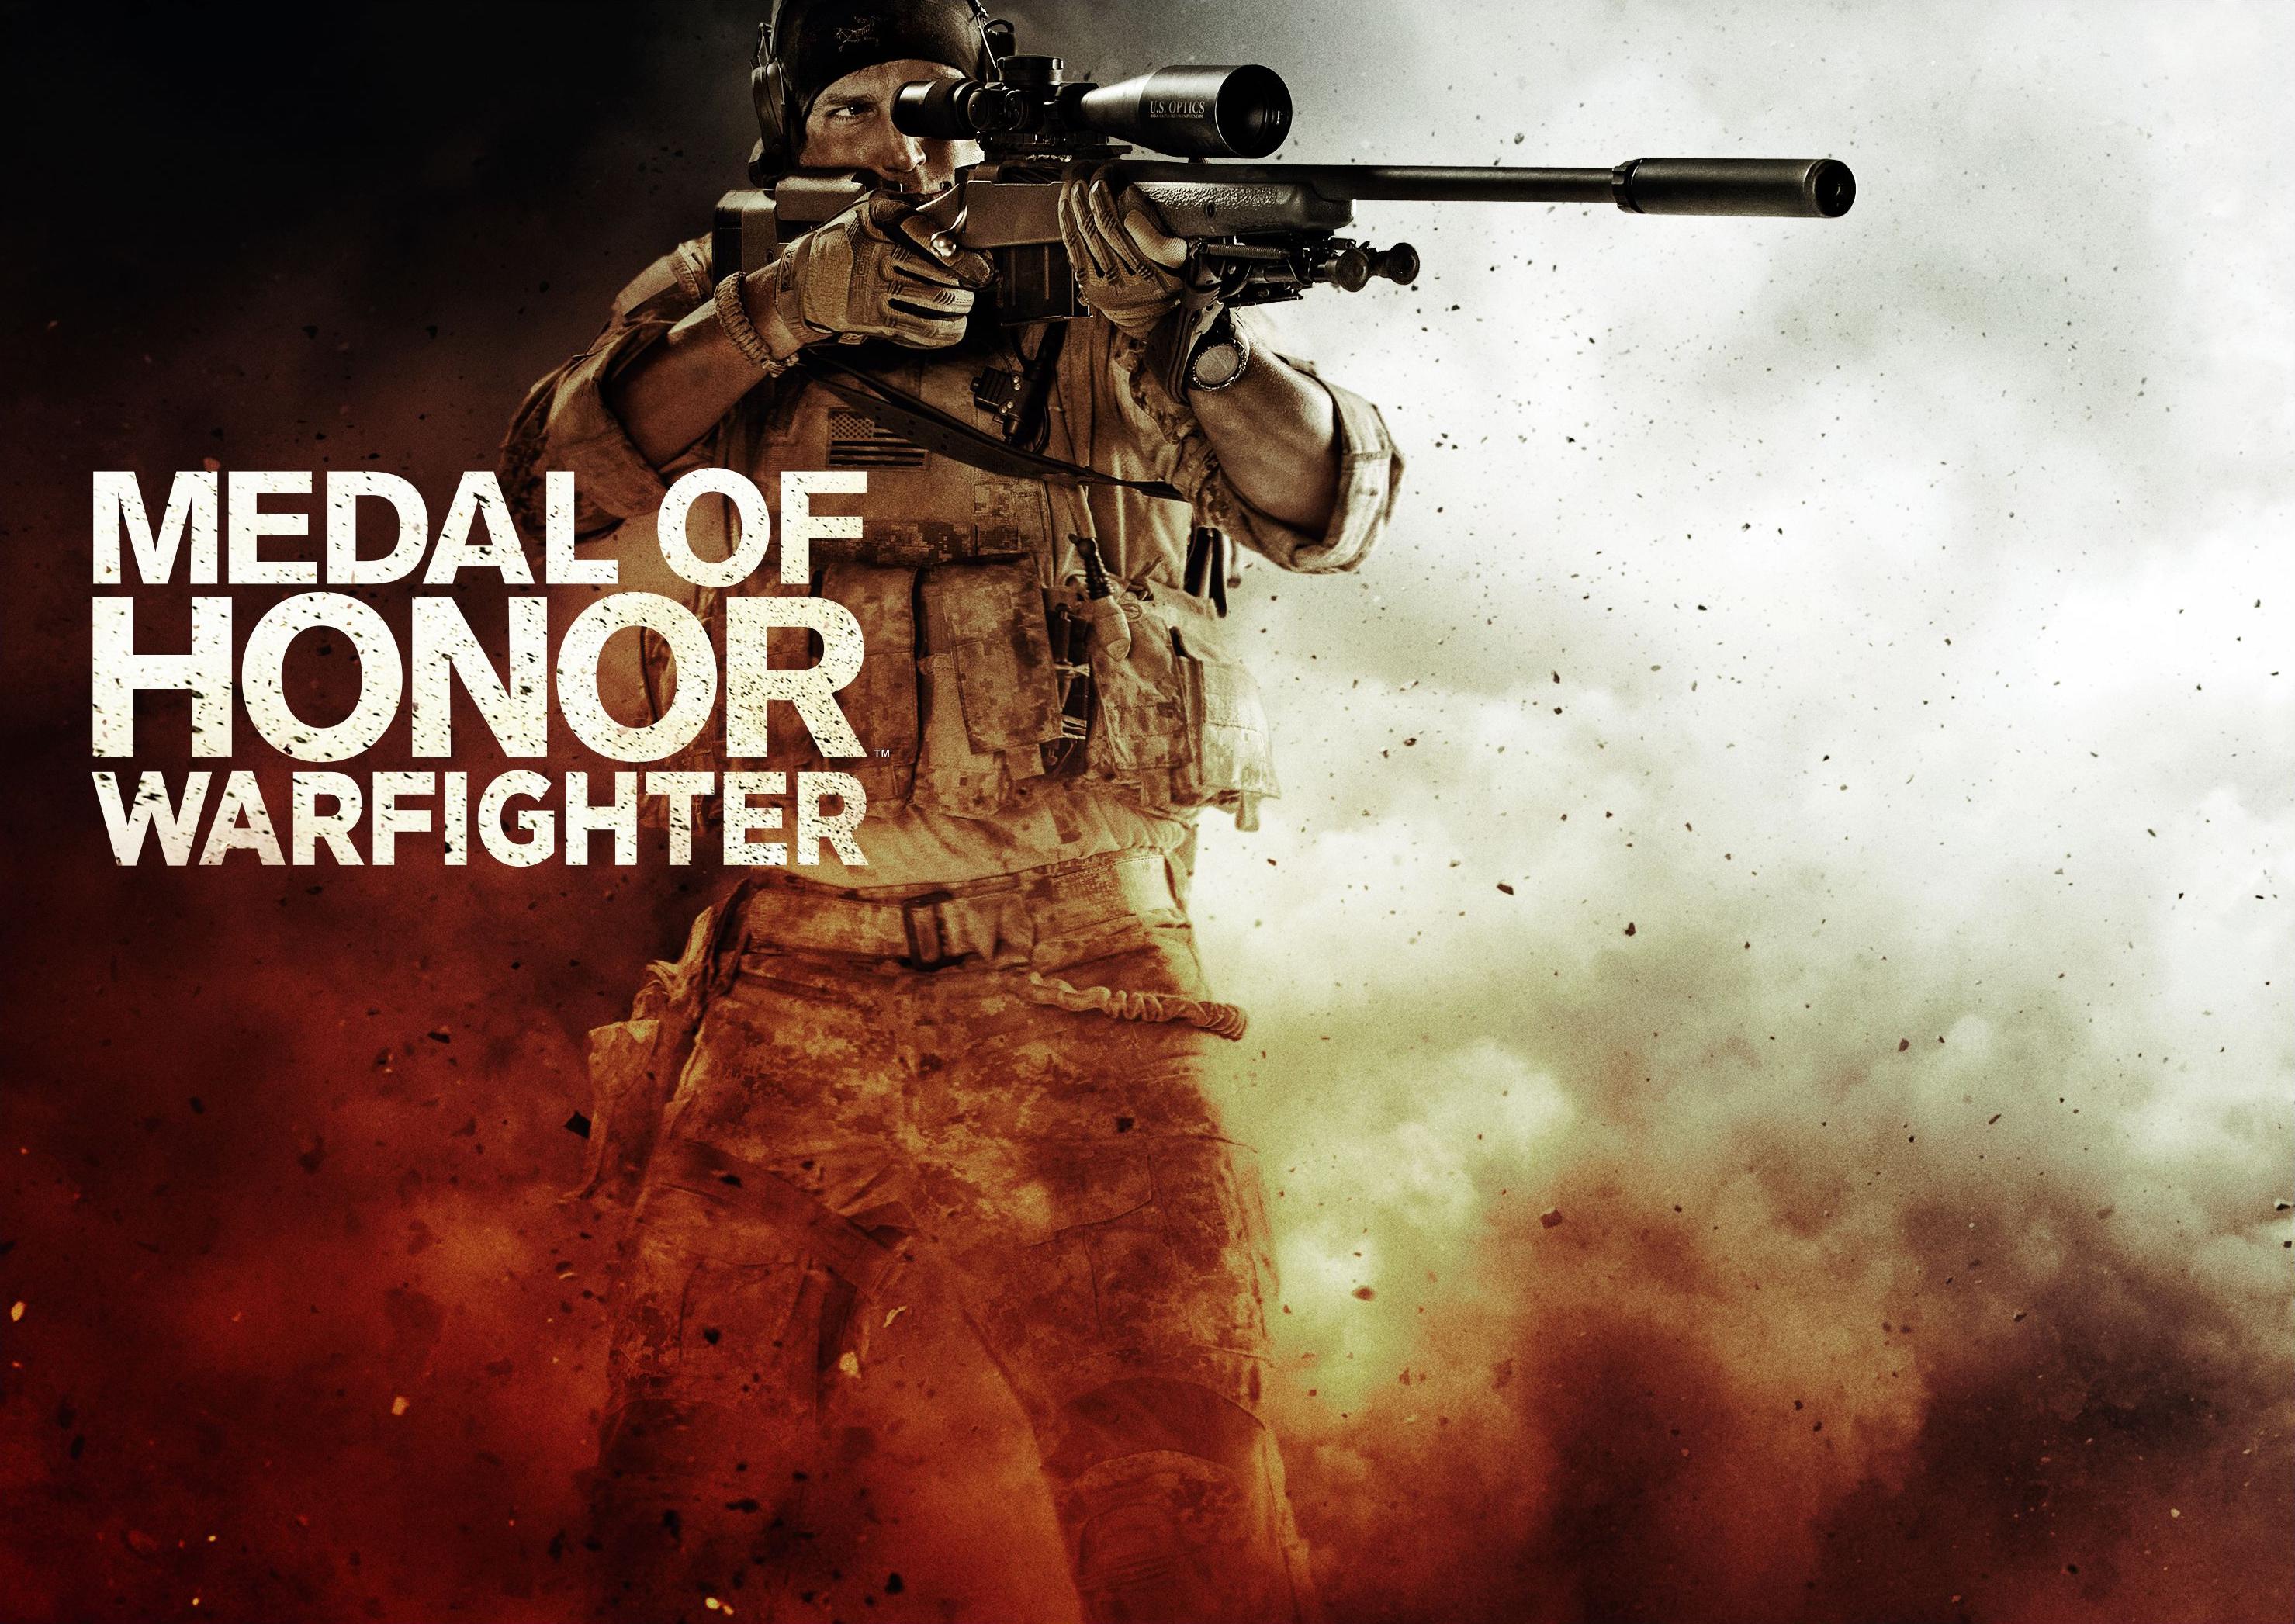 Medal Of Honor: Warfighter Computer Wallpapers, Desktop ...